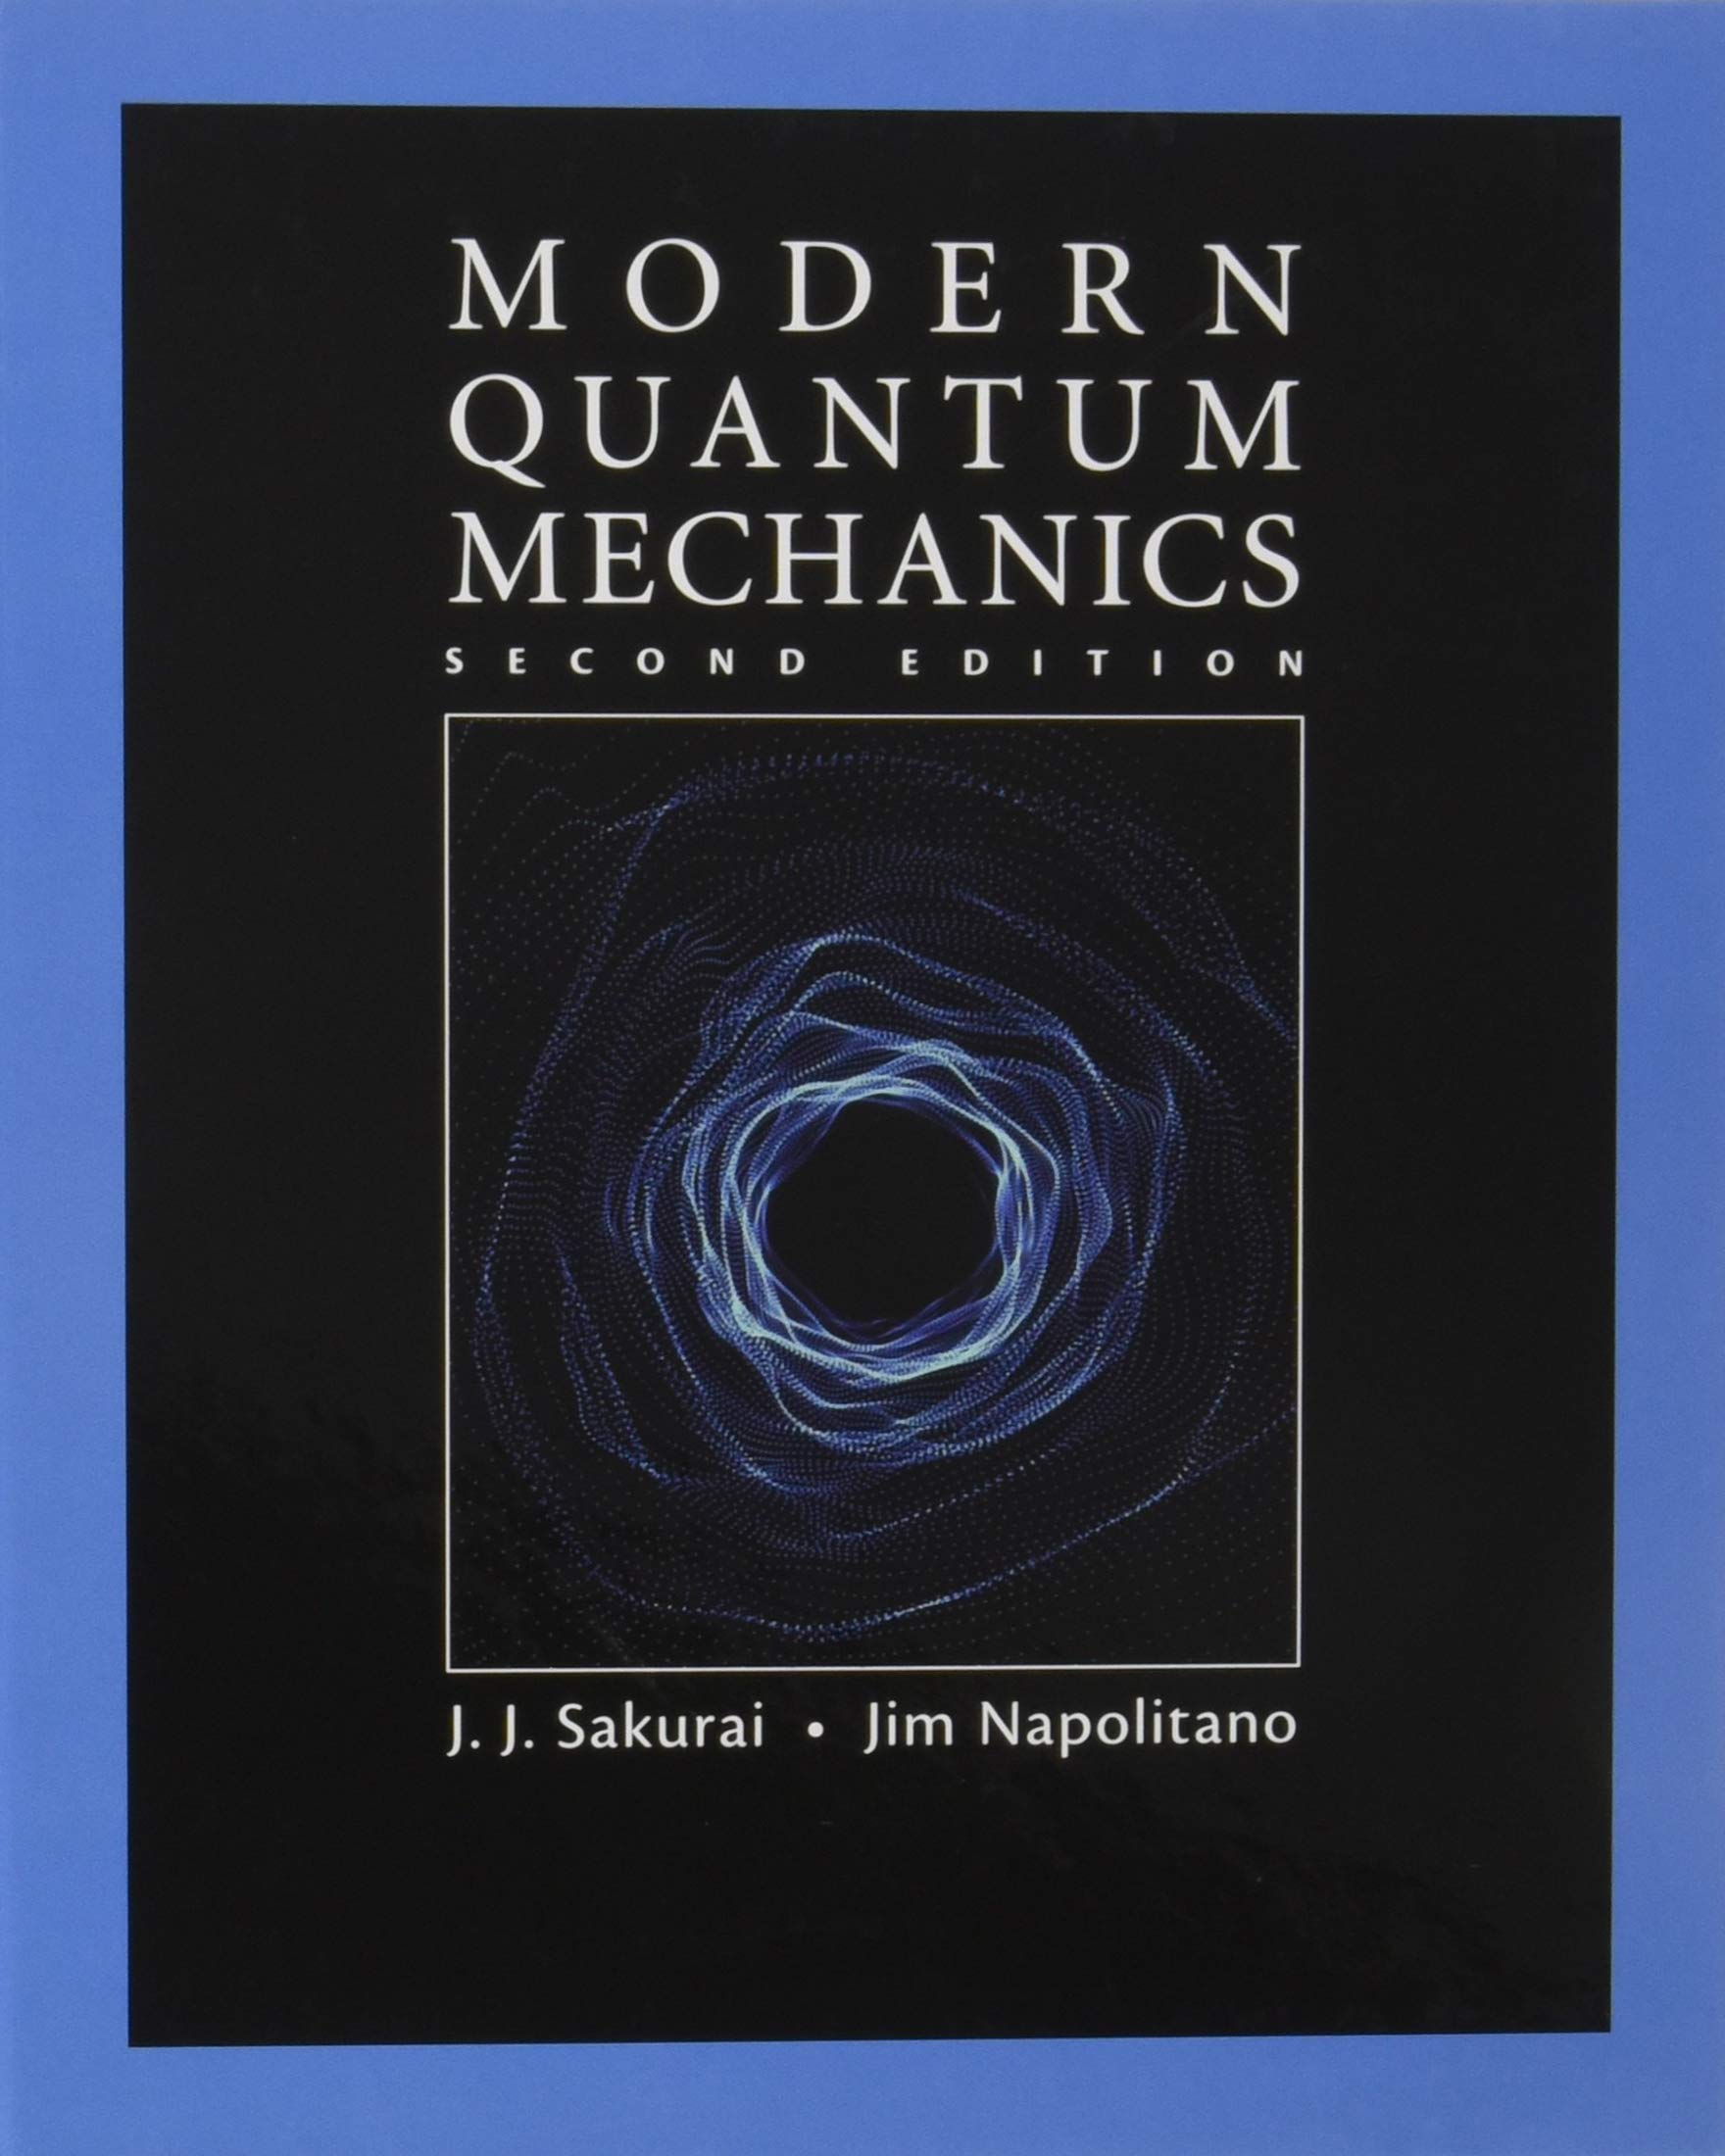 Modern Quantum Mechanics by Cambridge University Press